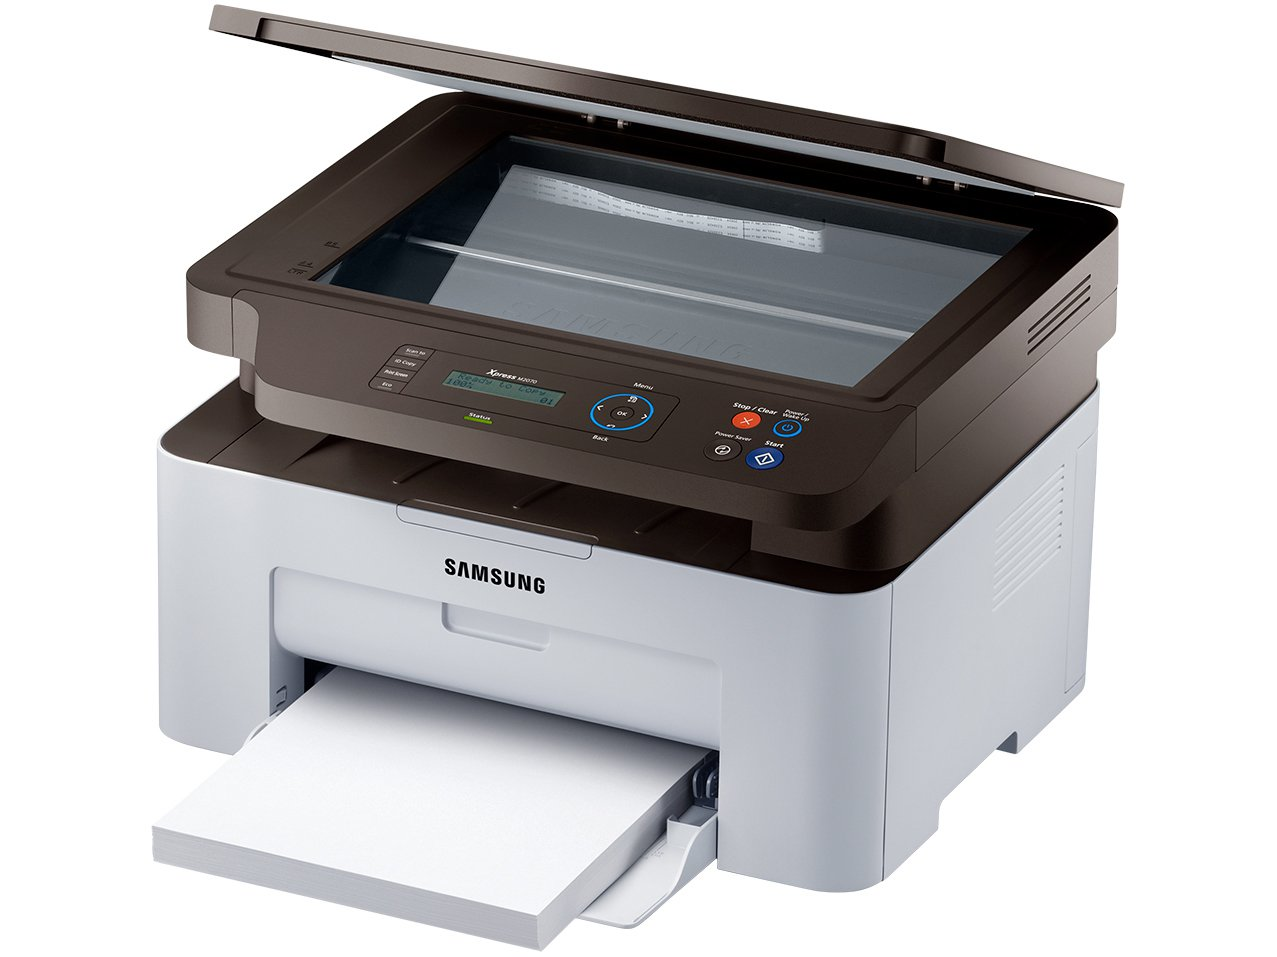 Foto 6 - Multifuncional Samsung Xpress M2070 - Monocromática Laser USB 2.0